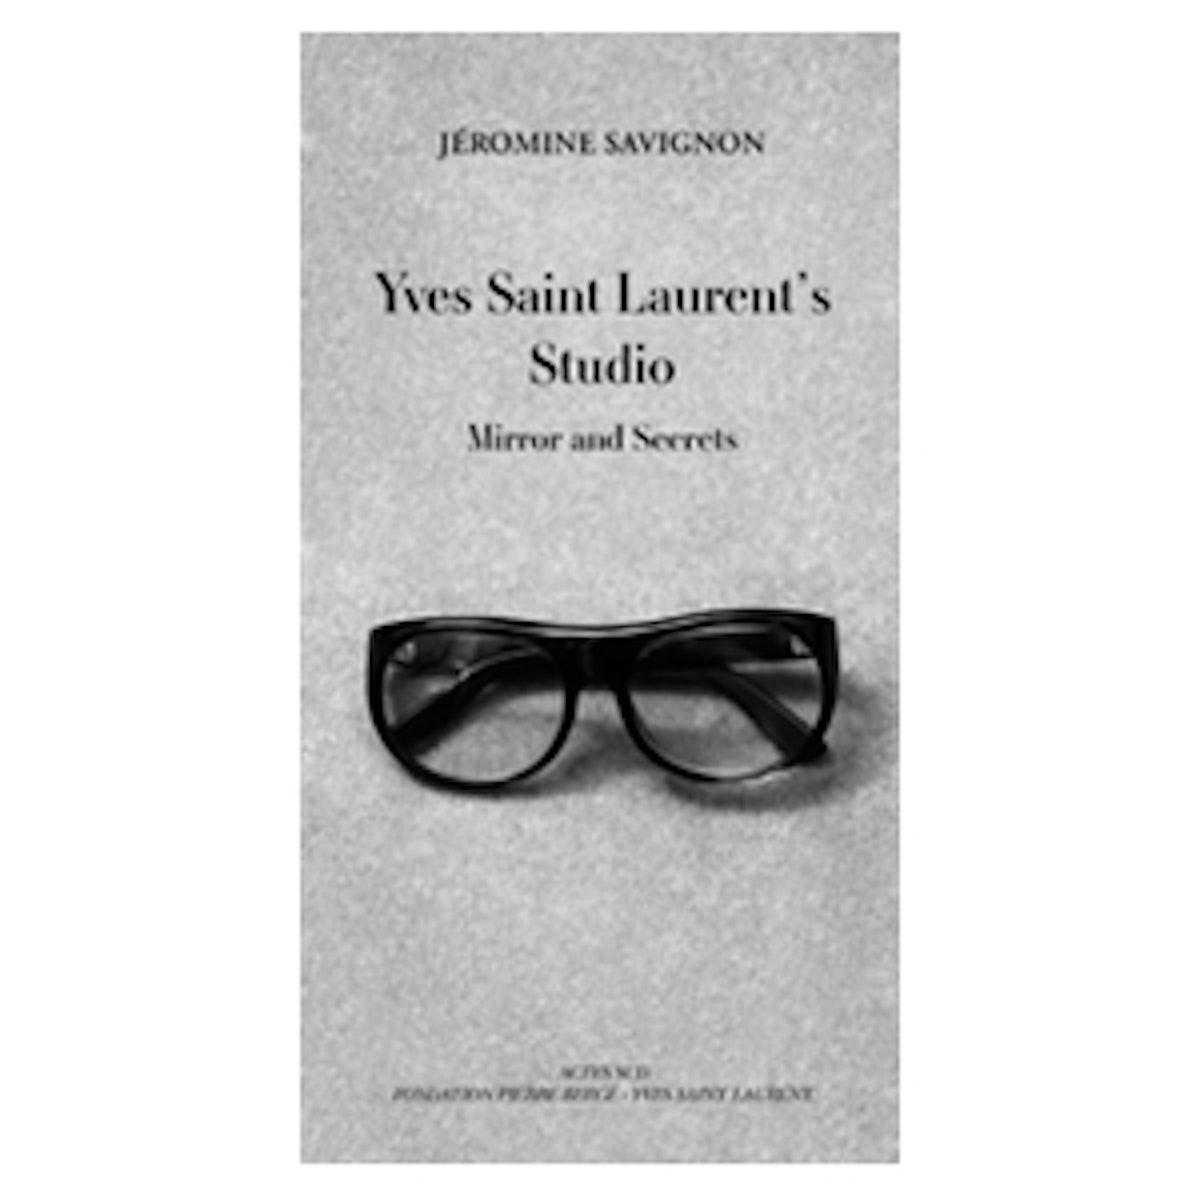 Yves Saint Laurent's Studio: Mirror and Secrets (Pre-Order)